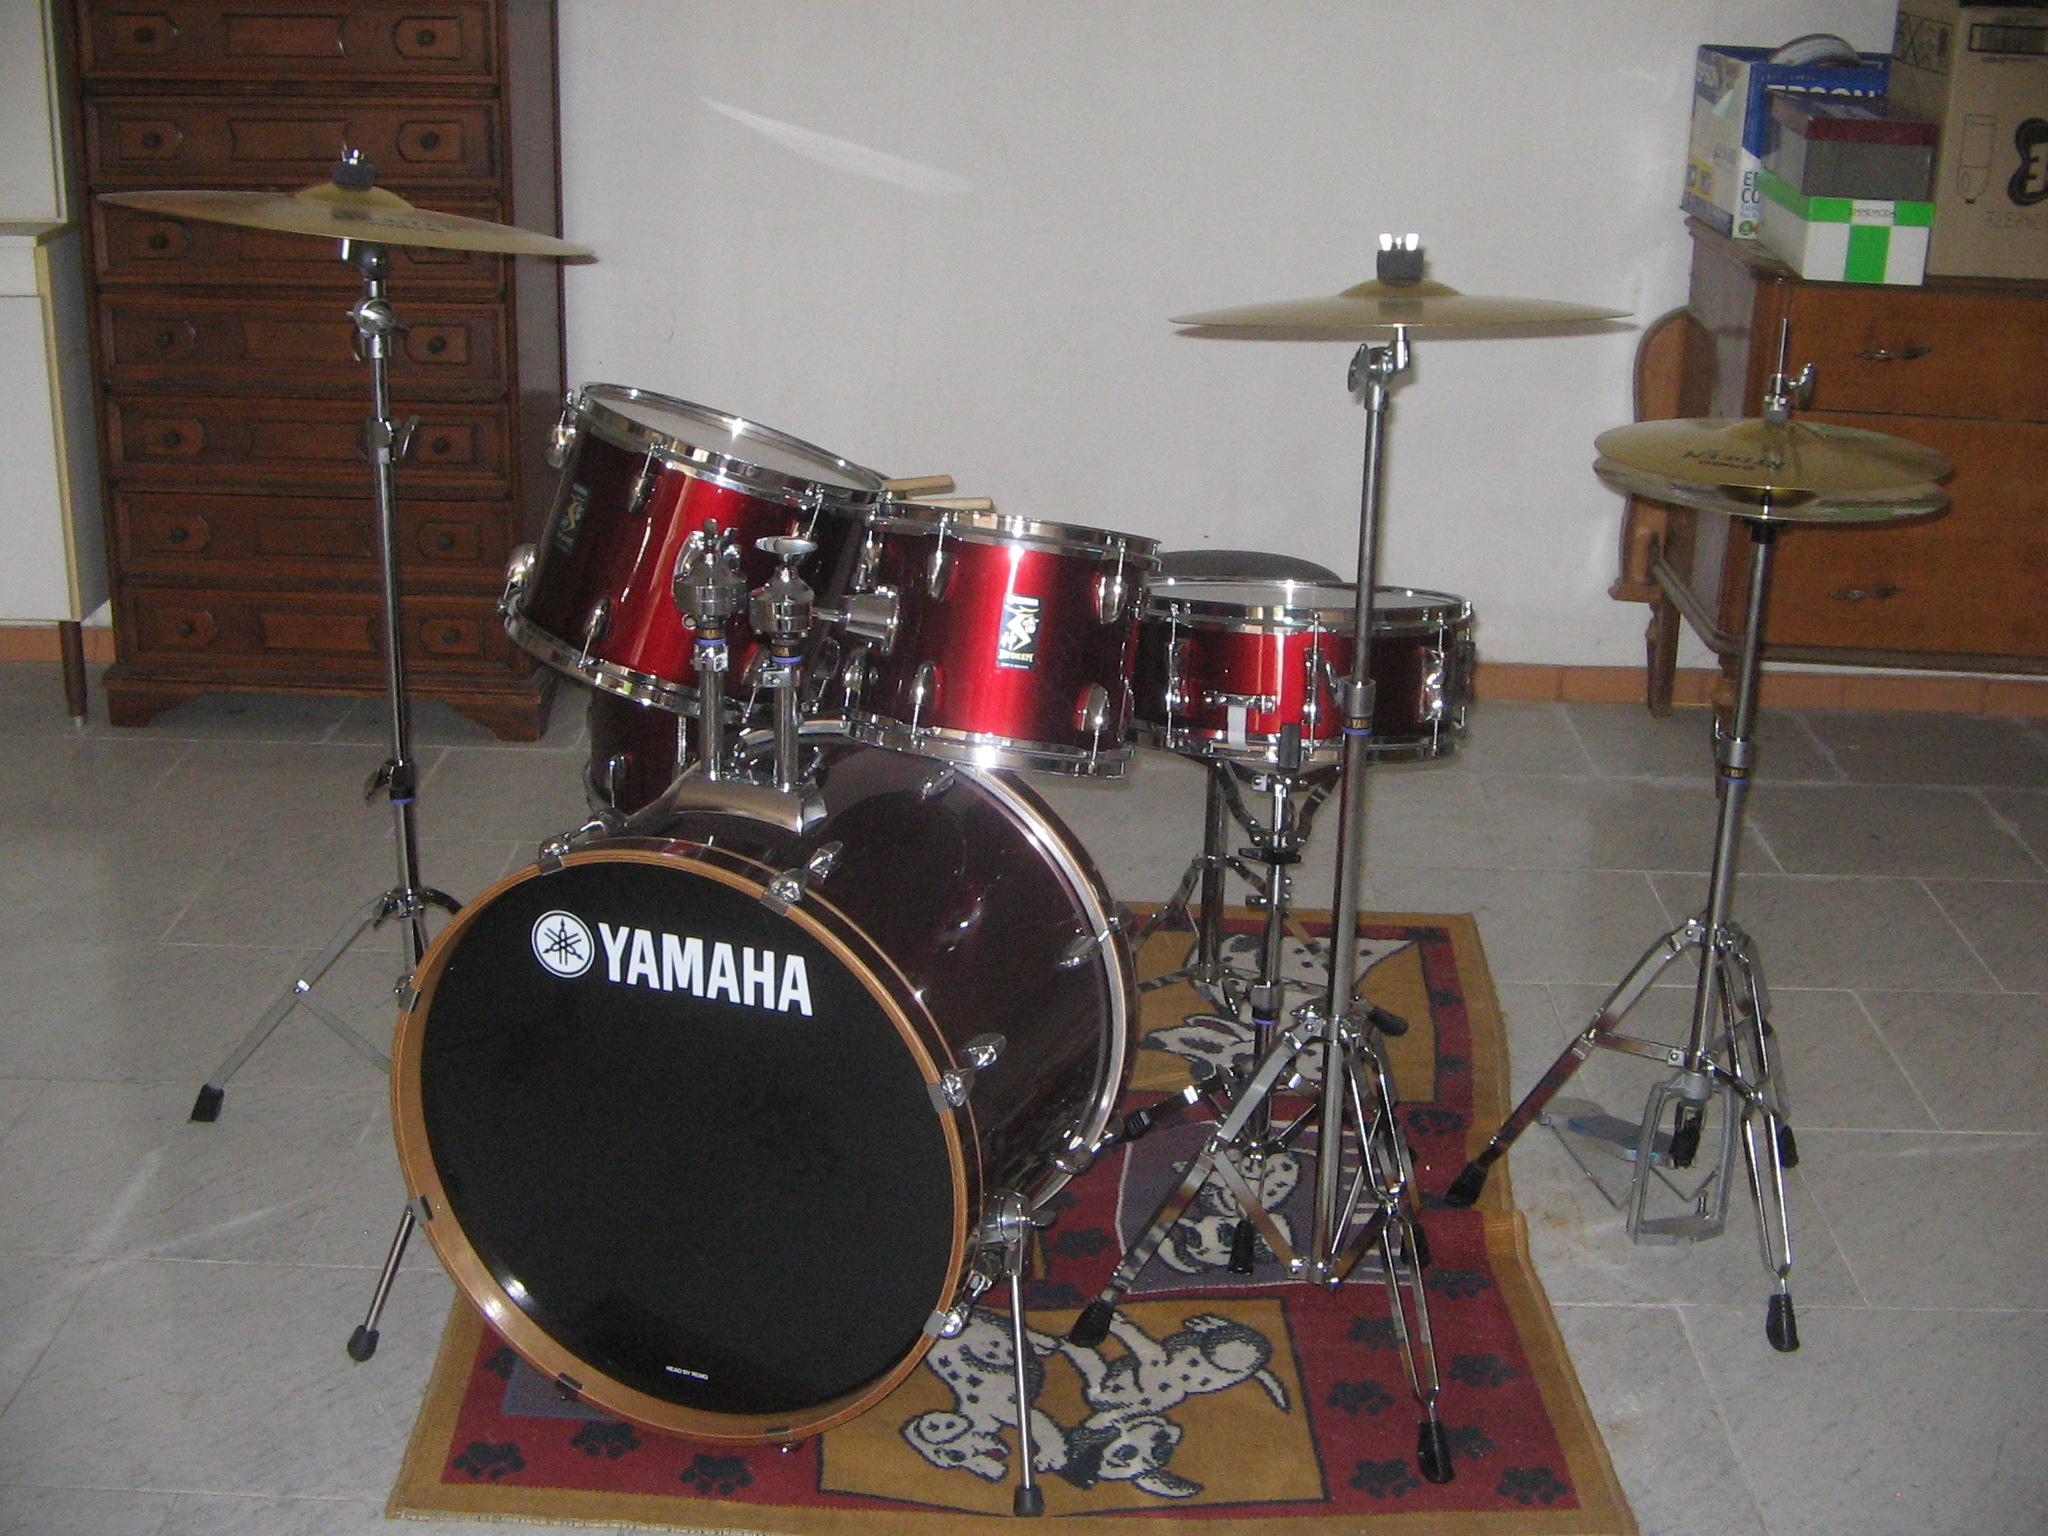 File Yamaha Drum Set Jpg Wikimedia Commons